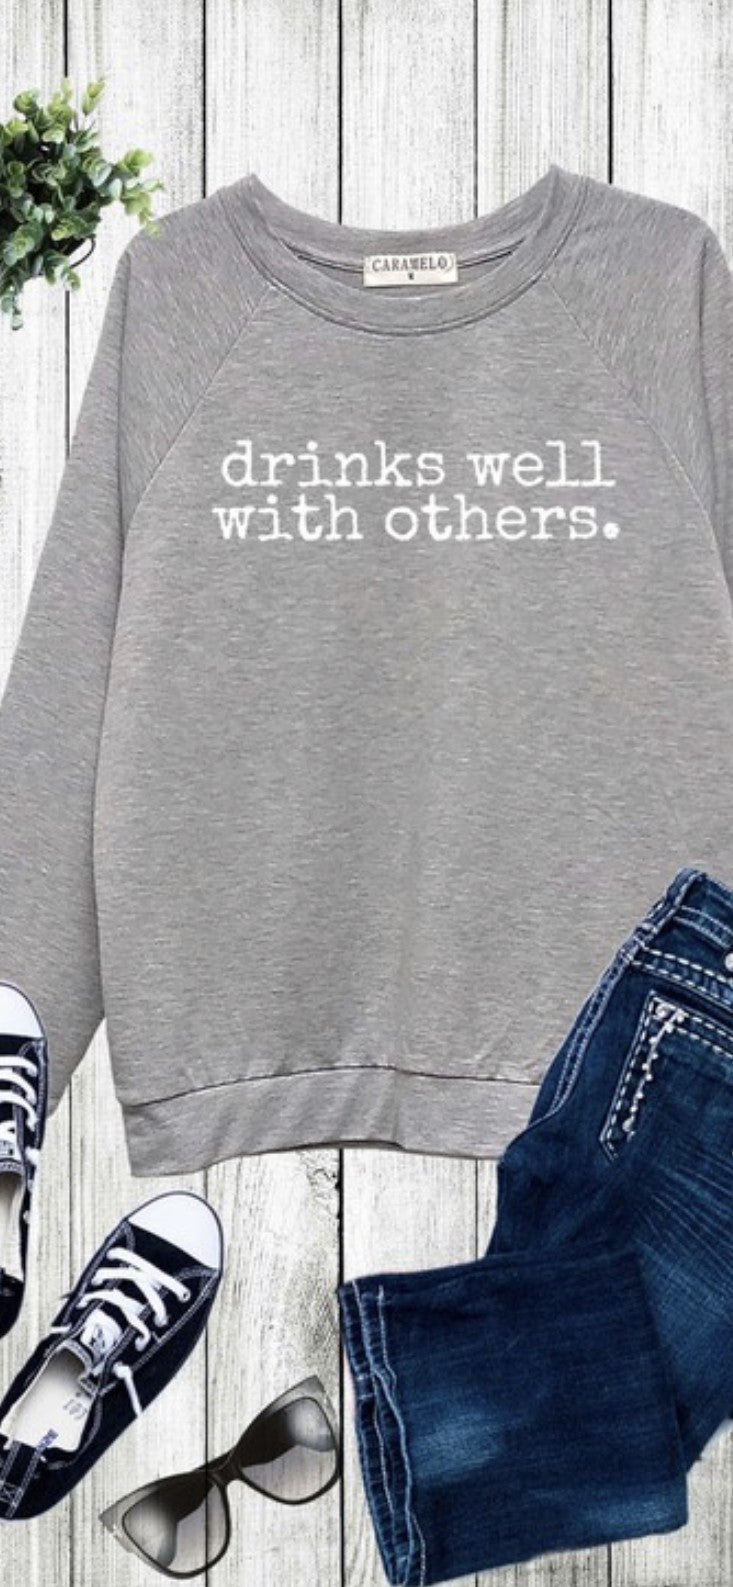 The Val Sweatshirt